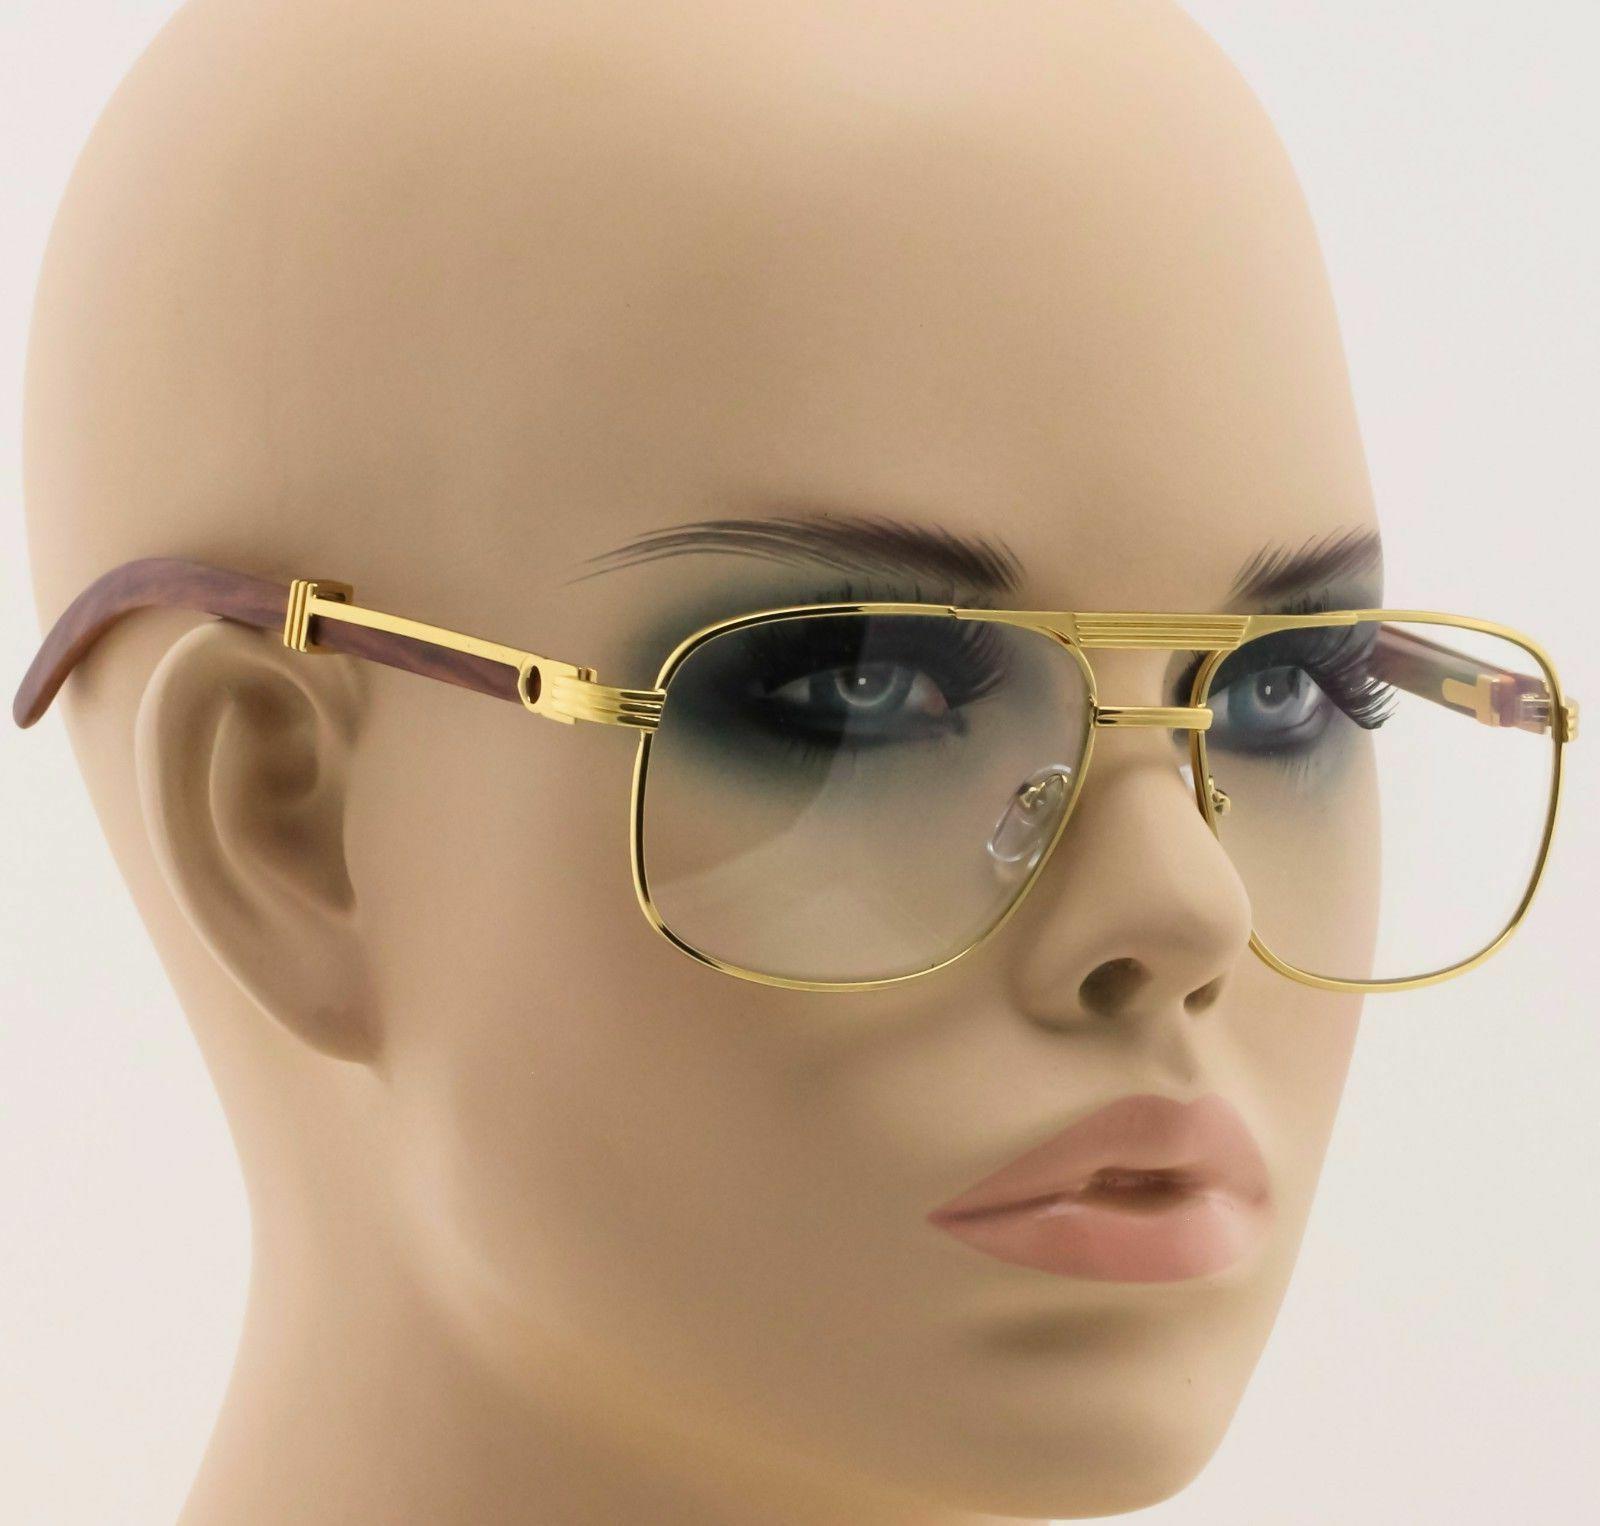 executive aviator eyeglasses clear lens sunglasses metal